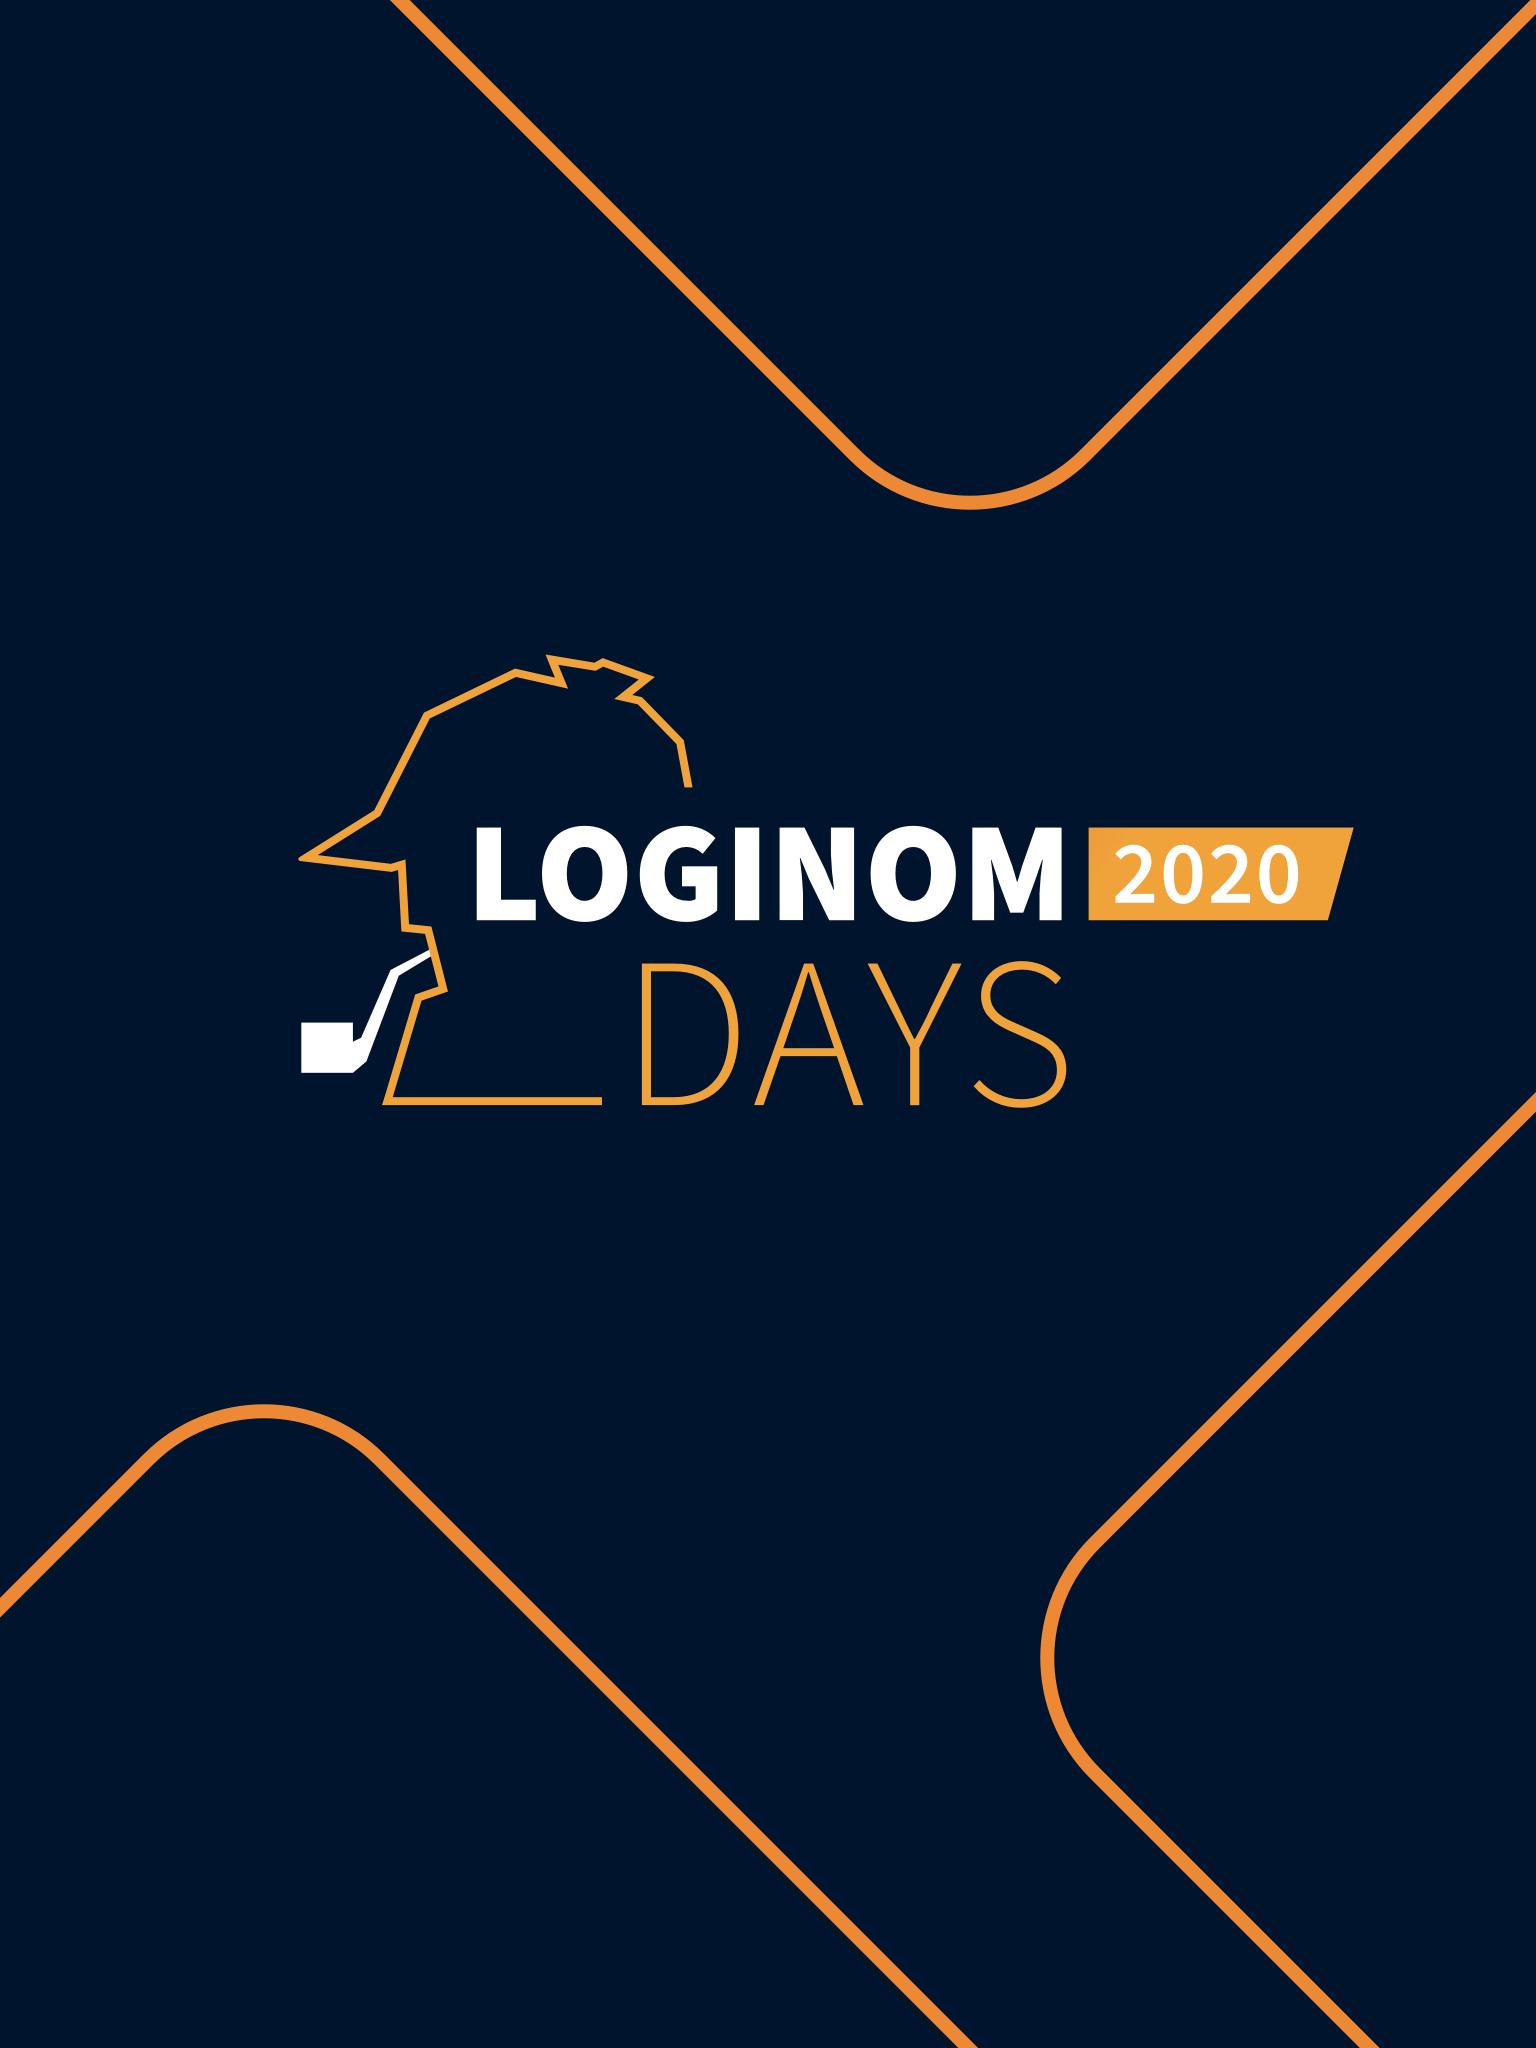 Loginom Day 2020